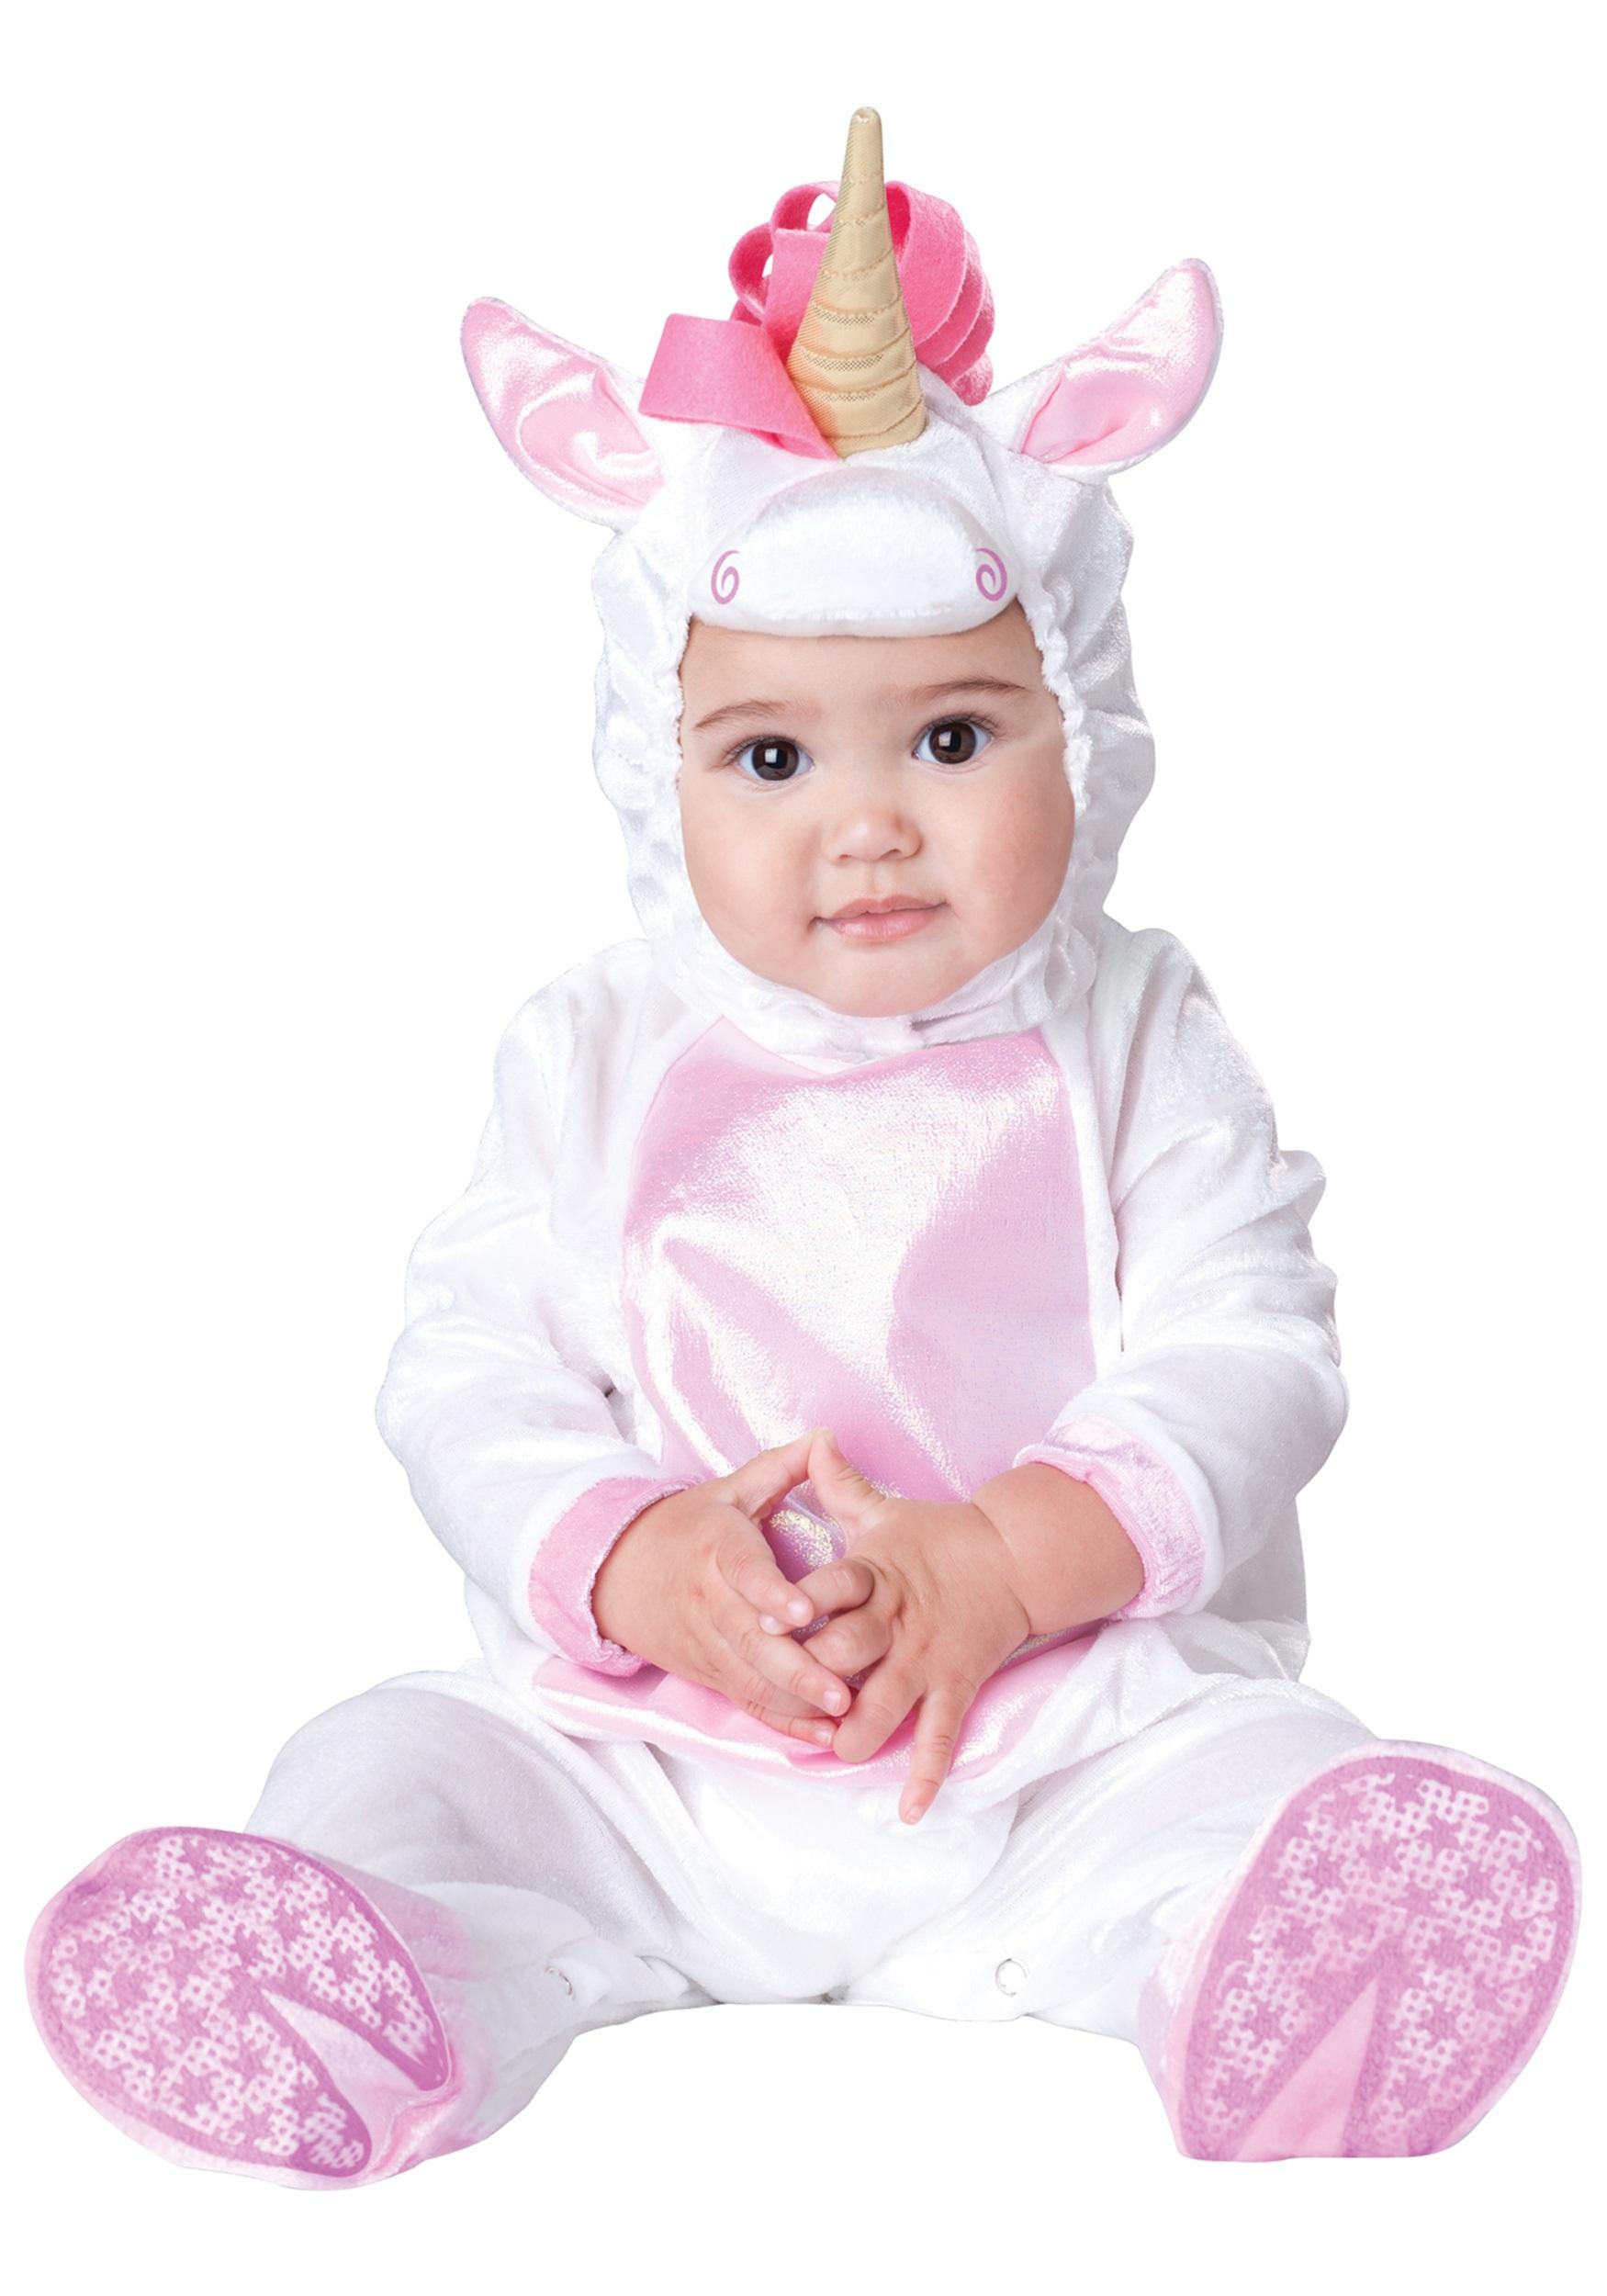 Infant Magical Unicorn Costume  sc 1 st  Halloween Costumes & Infant Magical Unicorn Costume - Halloween Costumes